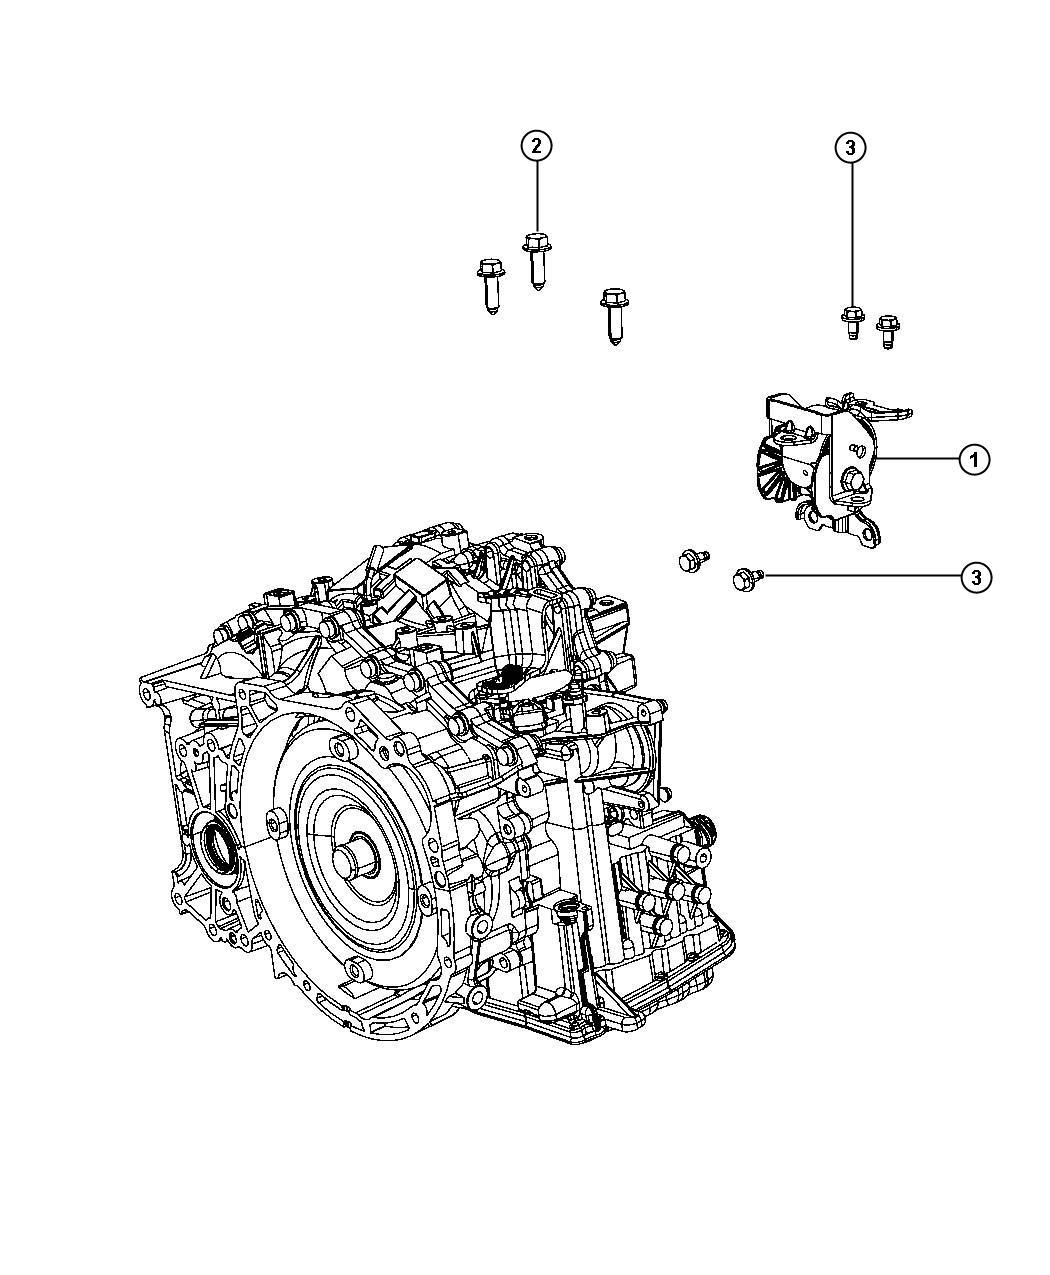 2013 Jeep Compass Engine Diagram Wiring Diagrams 2009 Insulator Left Side Mount 2012 Belt